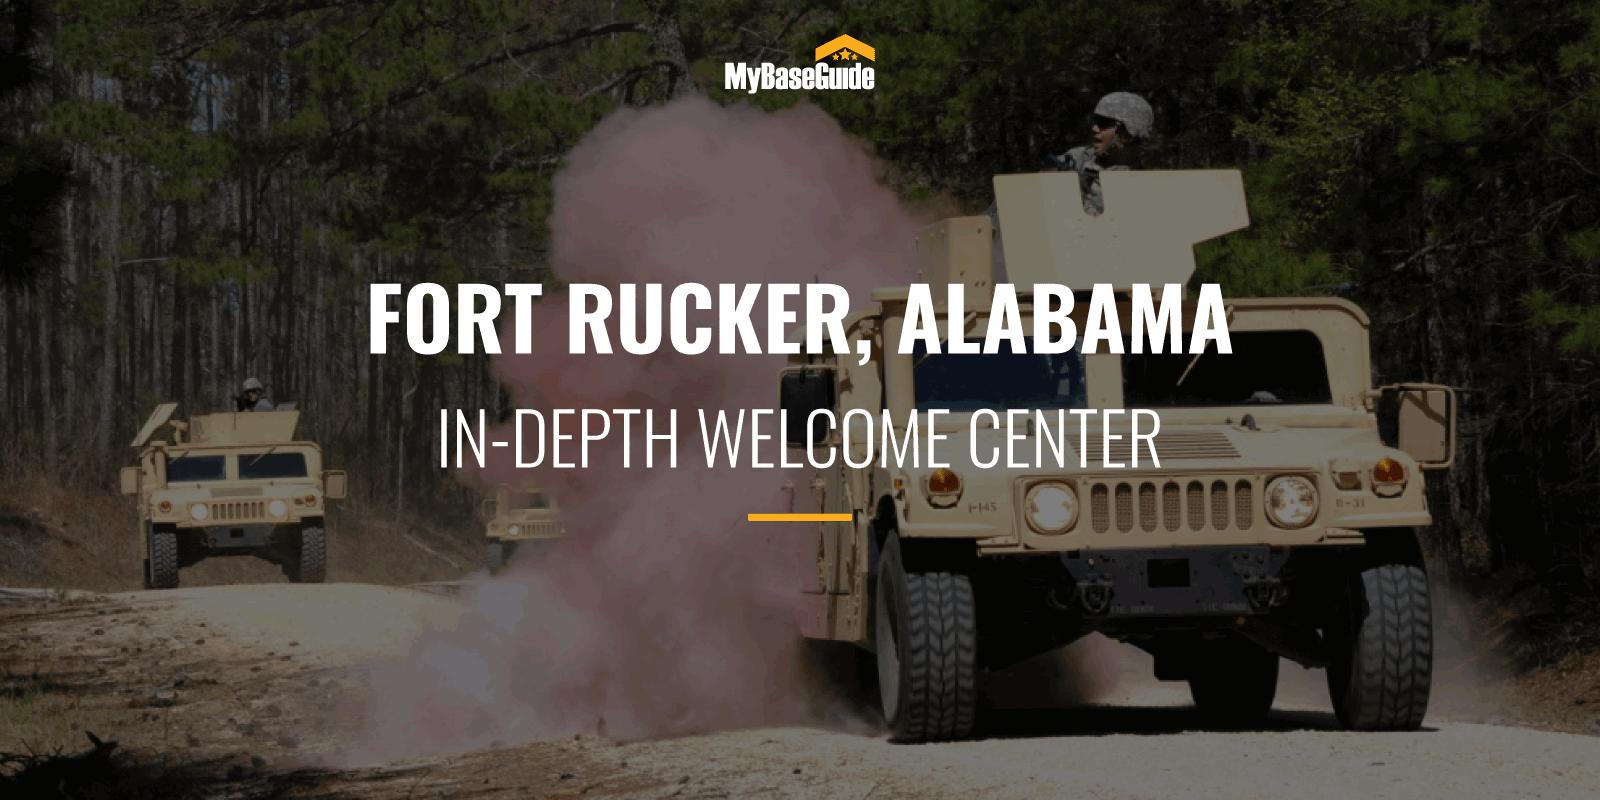 Fort Rucker In-Depth Welcome Center